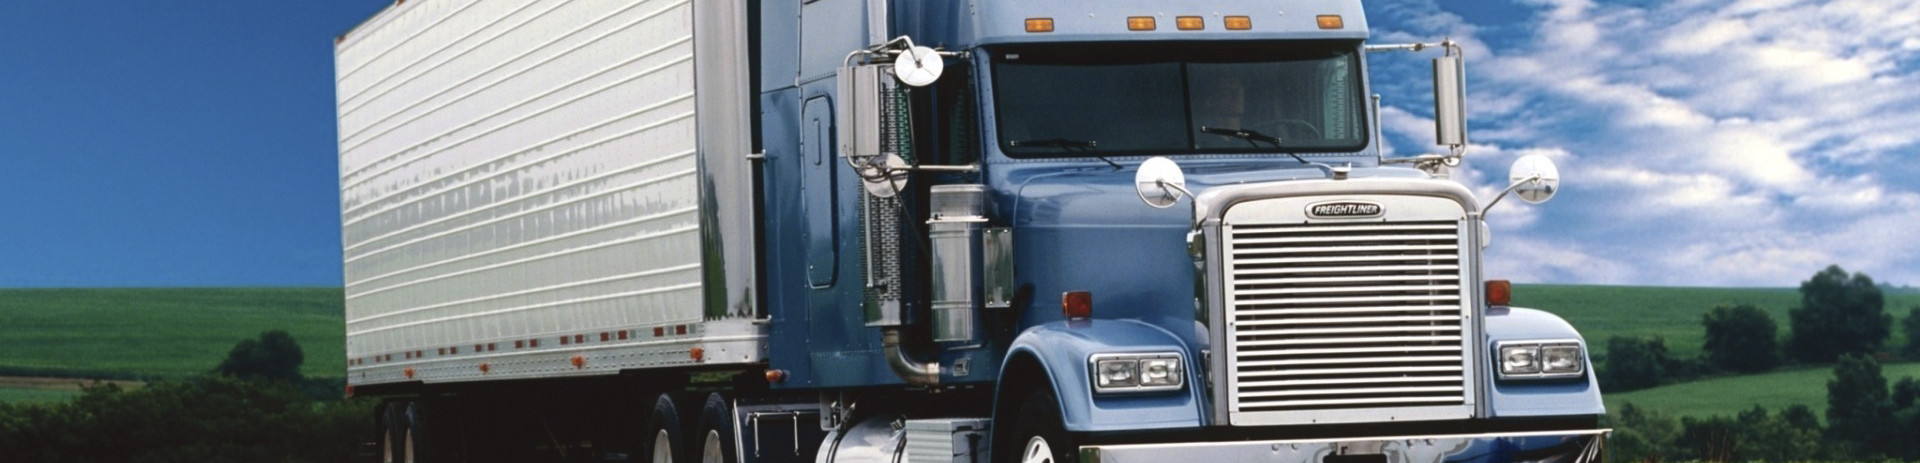 truck-f9a5c676e3-3000